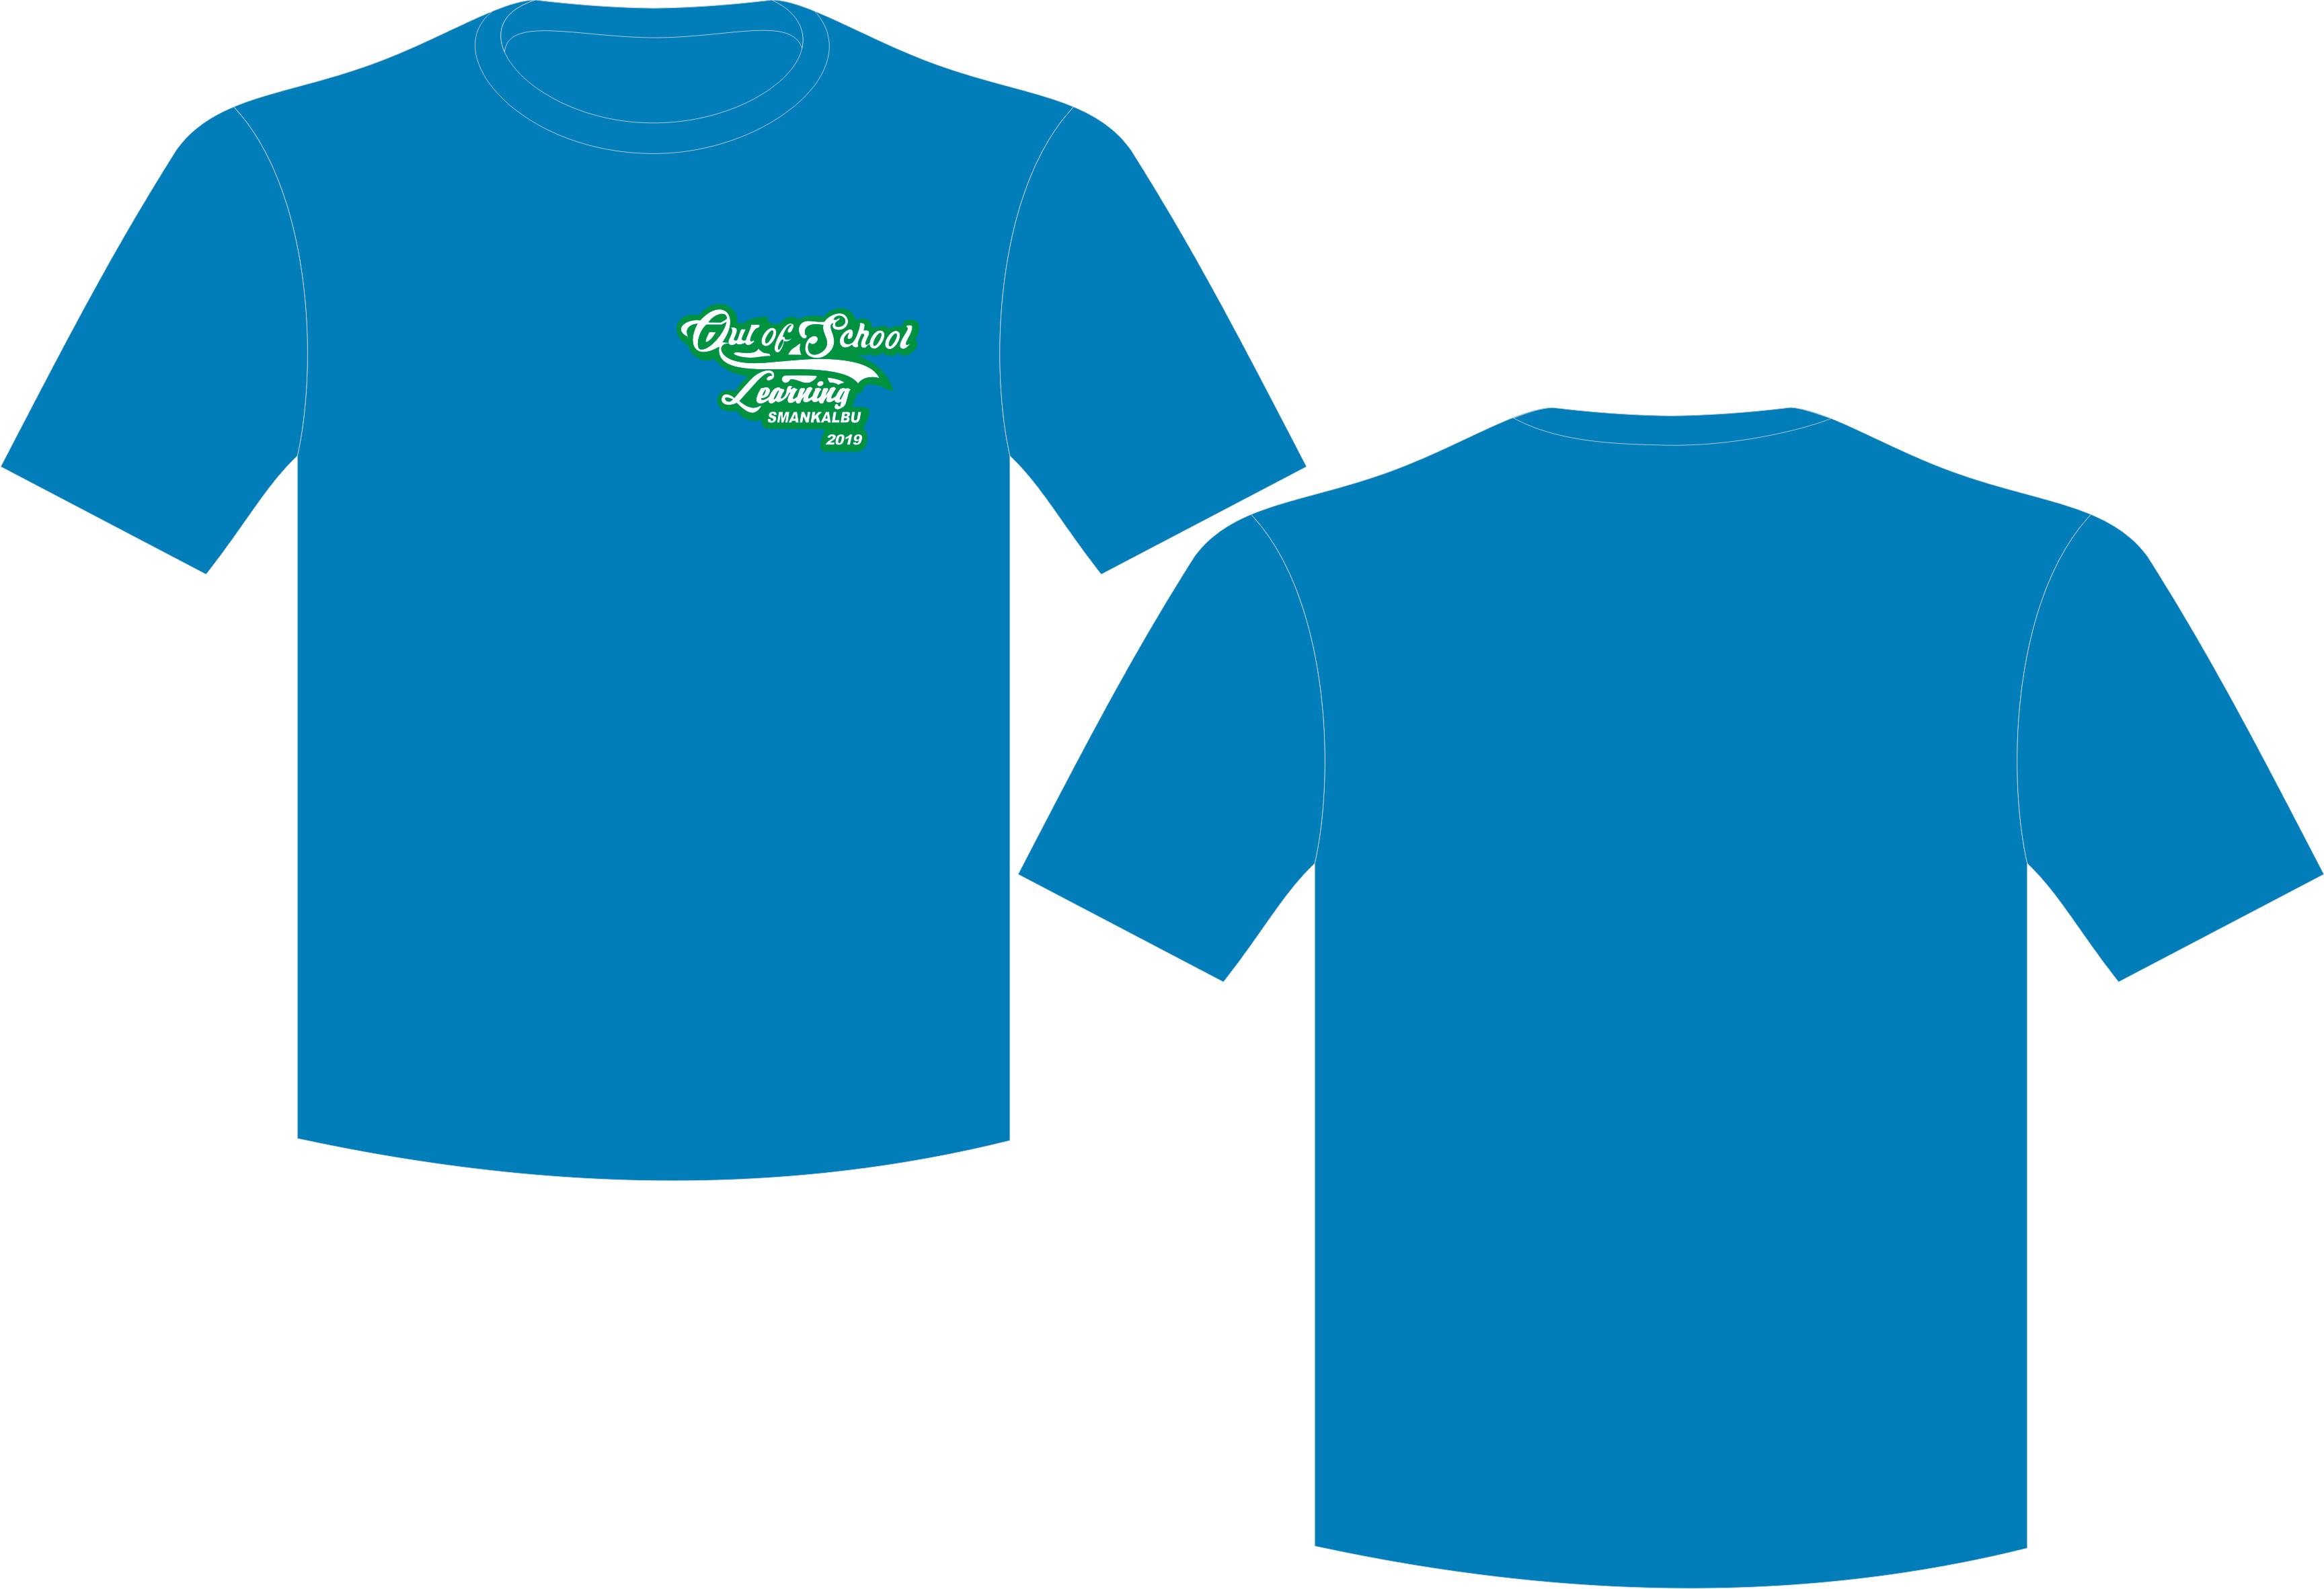 Kaos SMANKALBU 2, T-Shirt Oblong